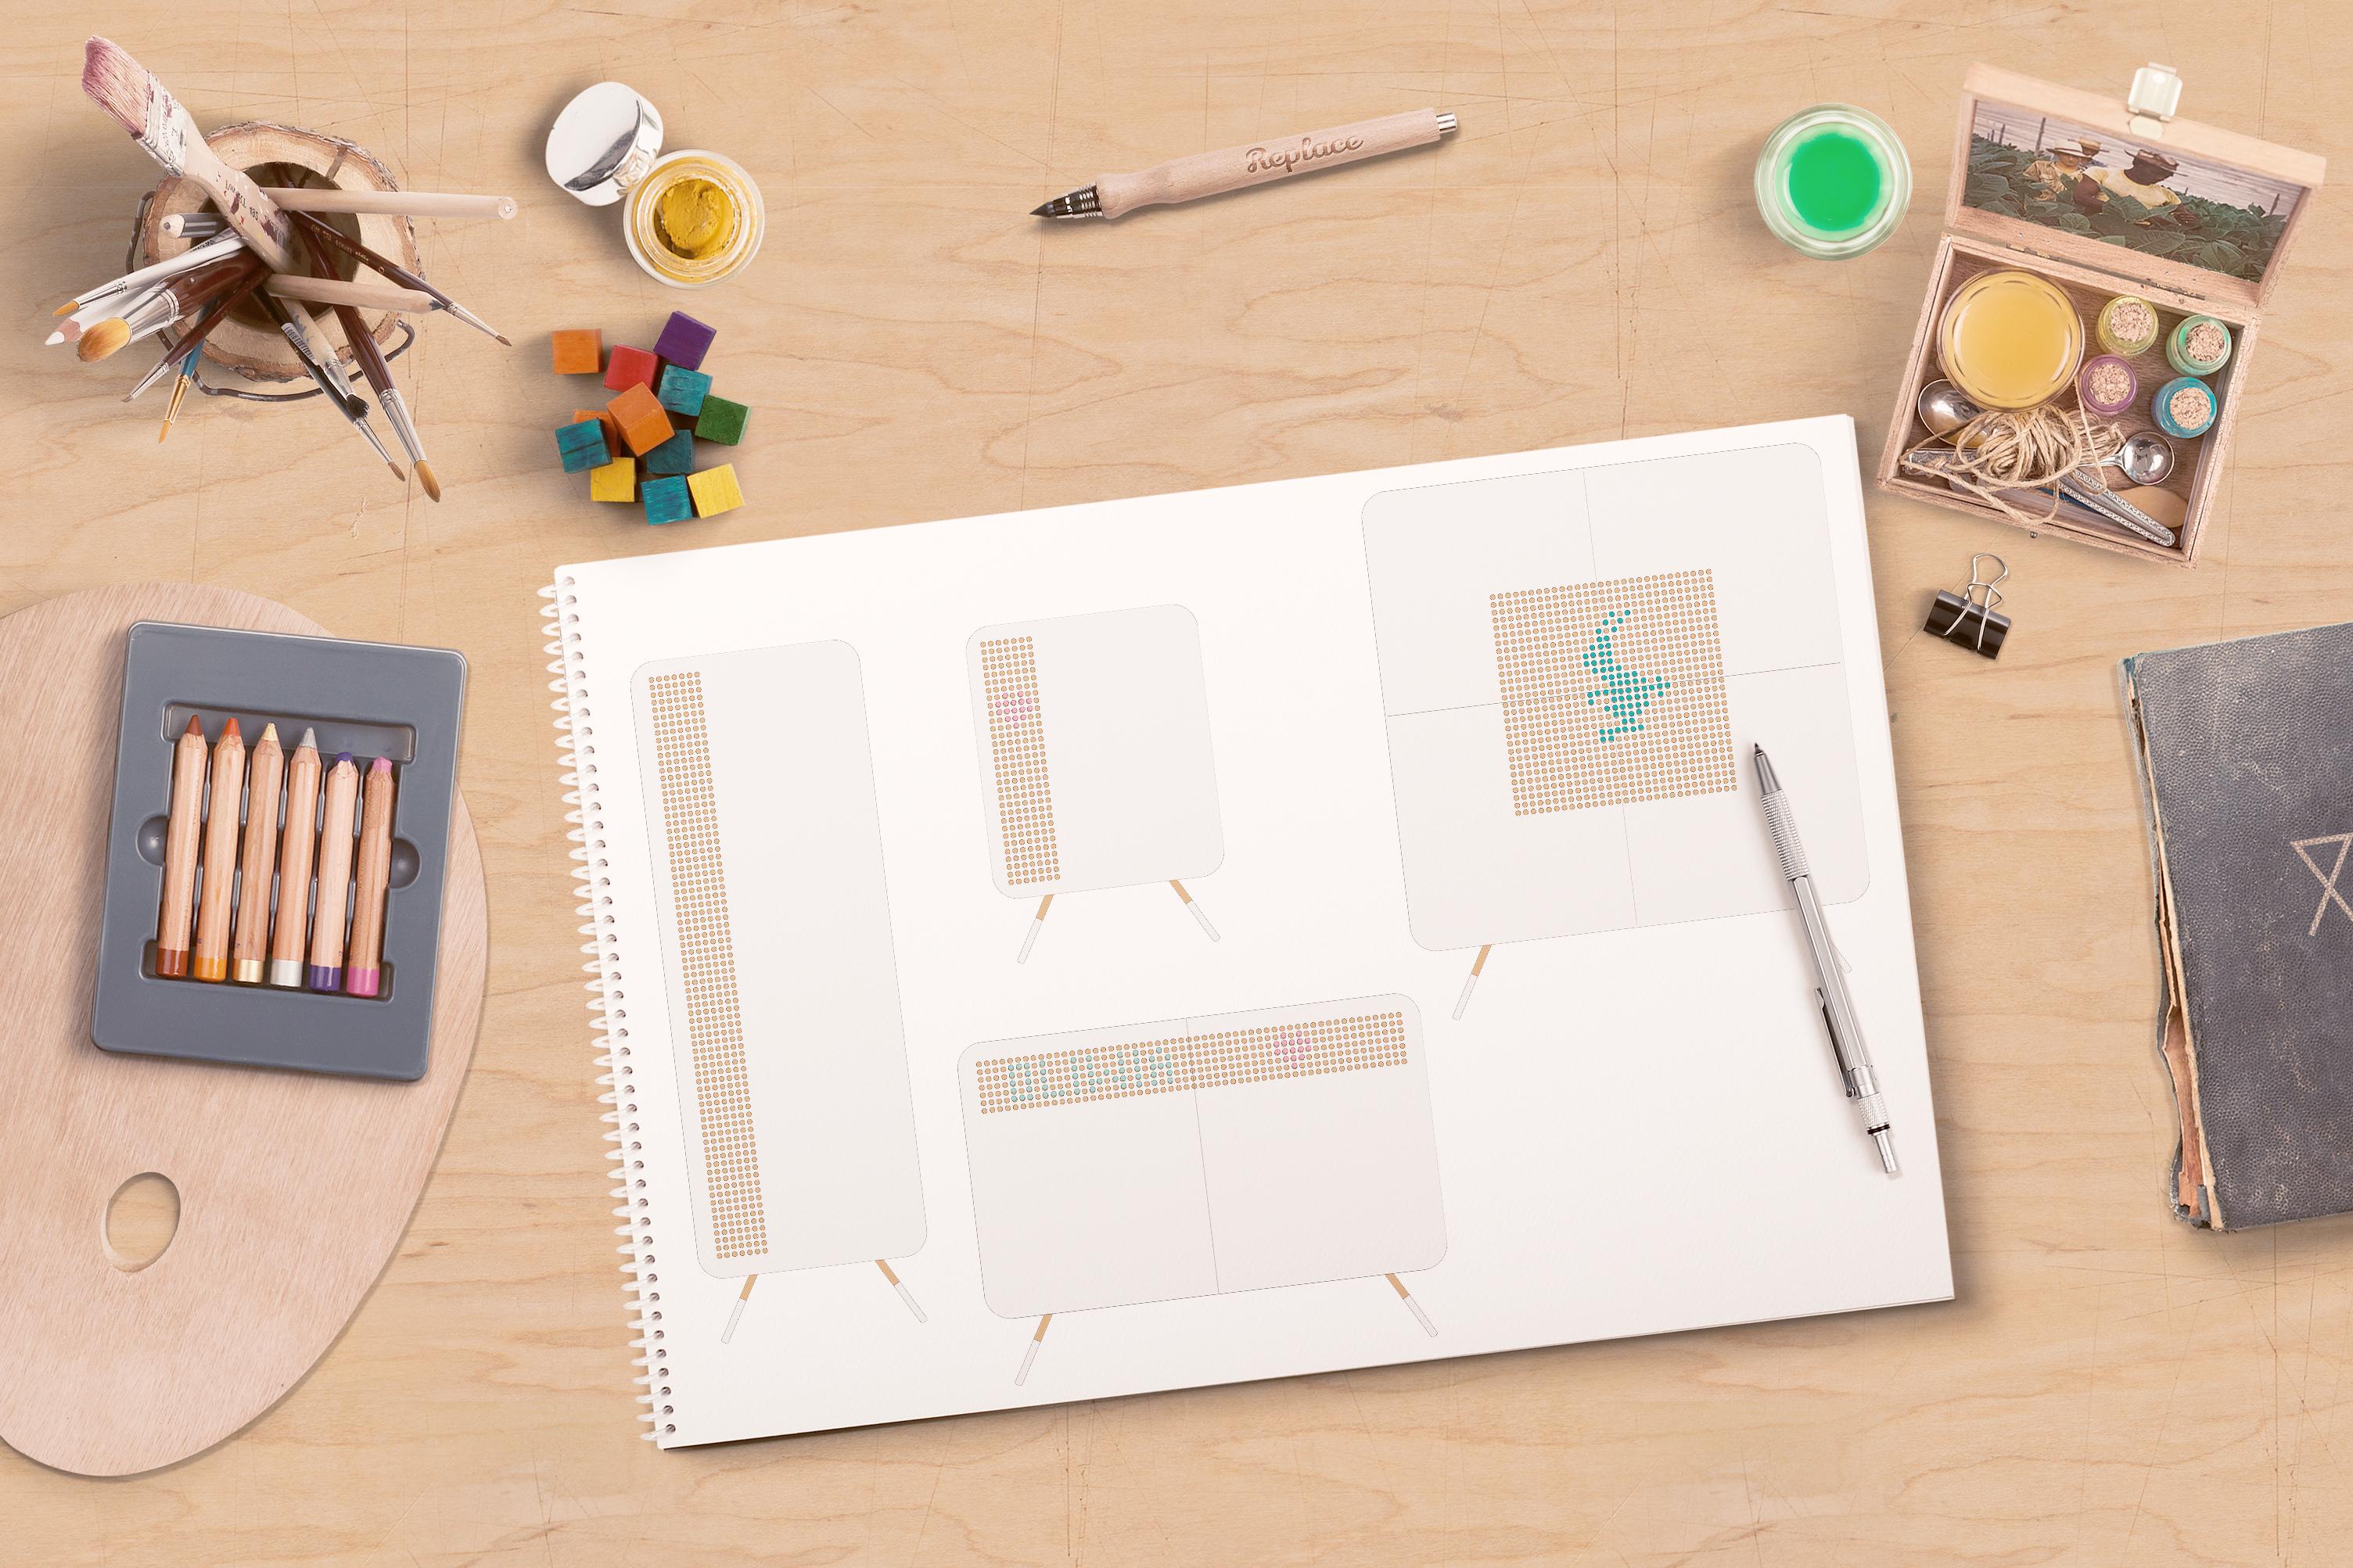 wci-cho-furniture-set-for-children-pawlowska-design-visualization-5